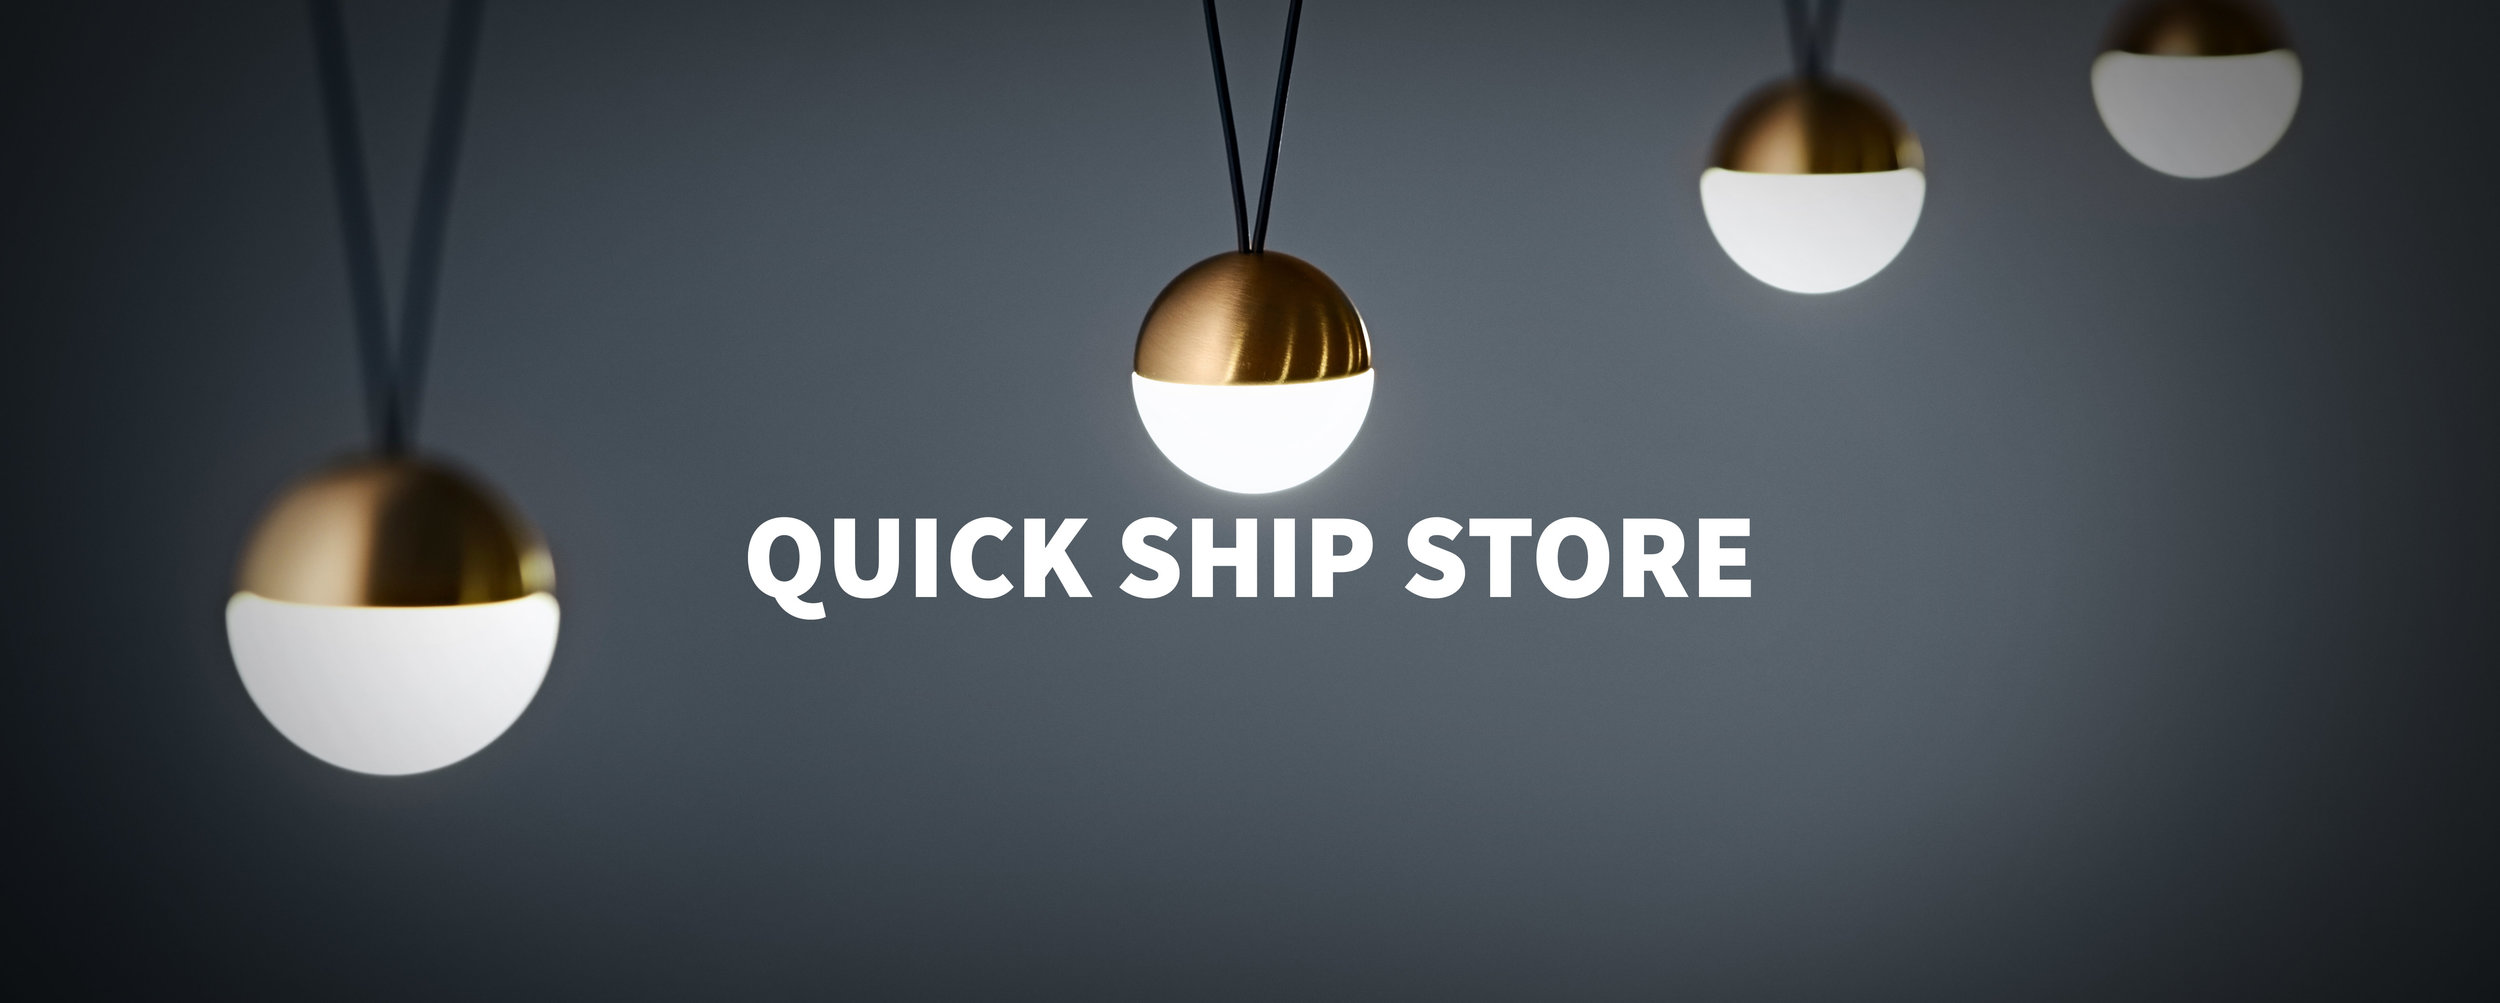 Quick-ship-store_Snitch_Detail_Pendant.jpg